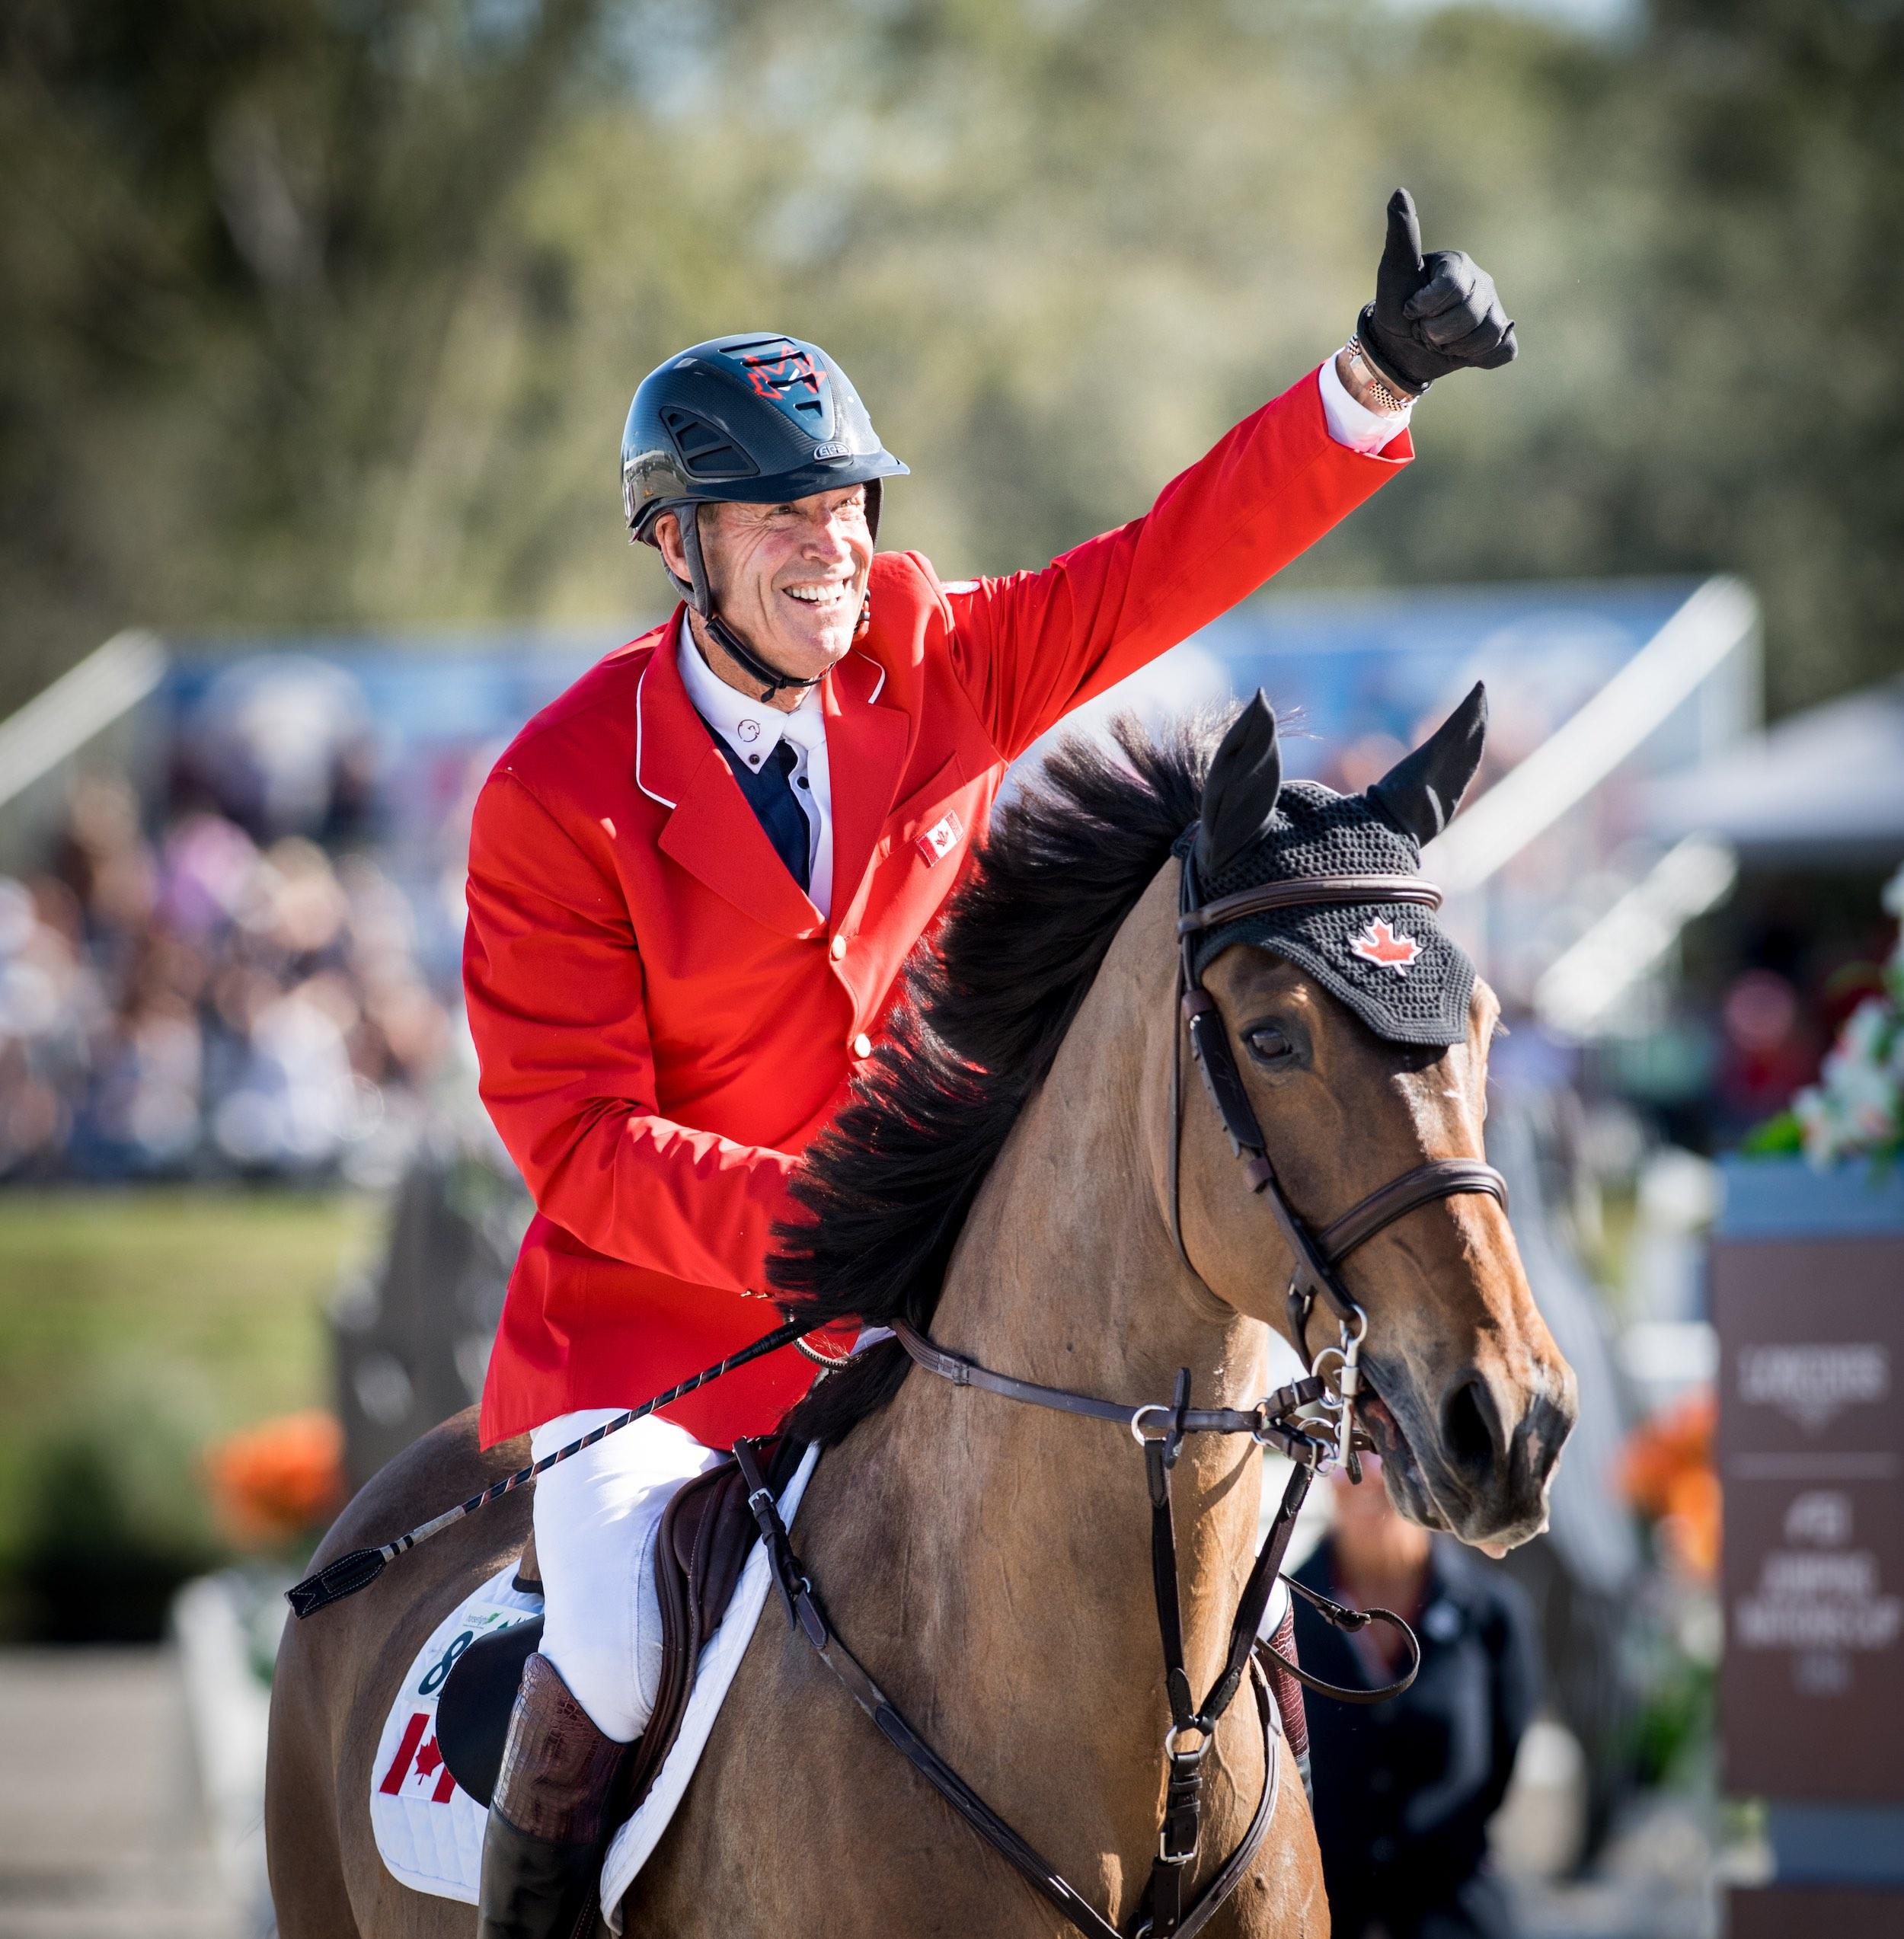 Ian Millar: Captain Canada Retires